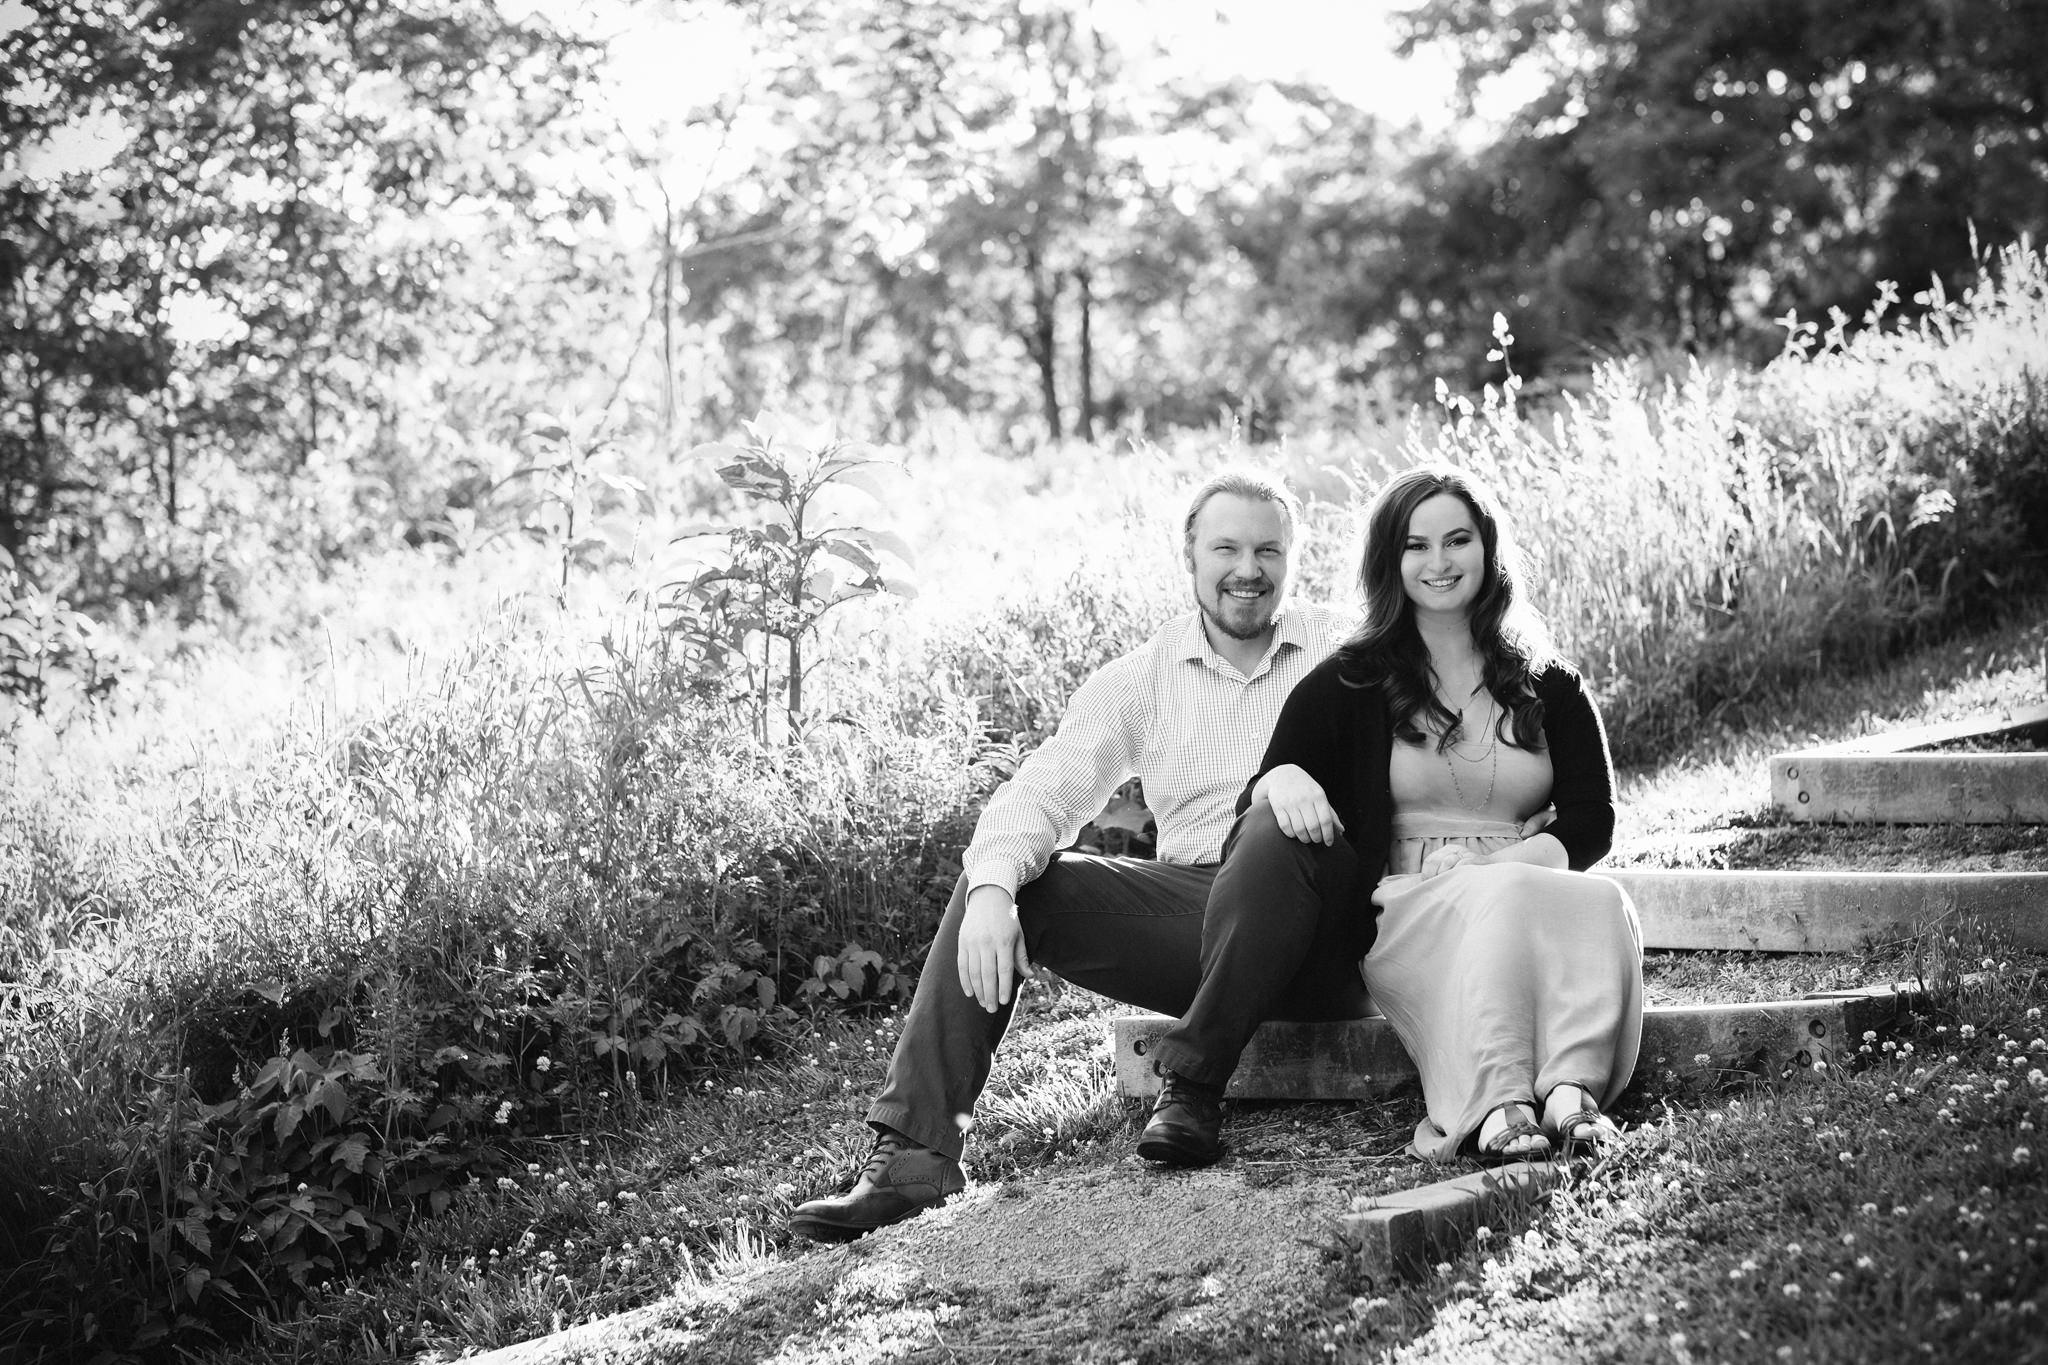 Anya&Matt_Engagement_Blog_002.jpg